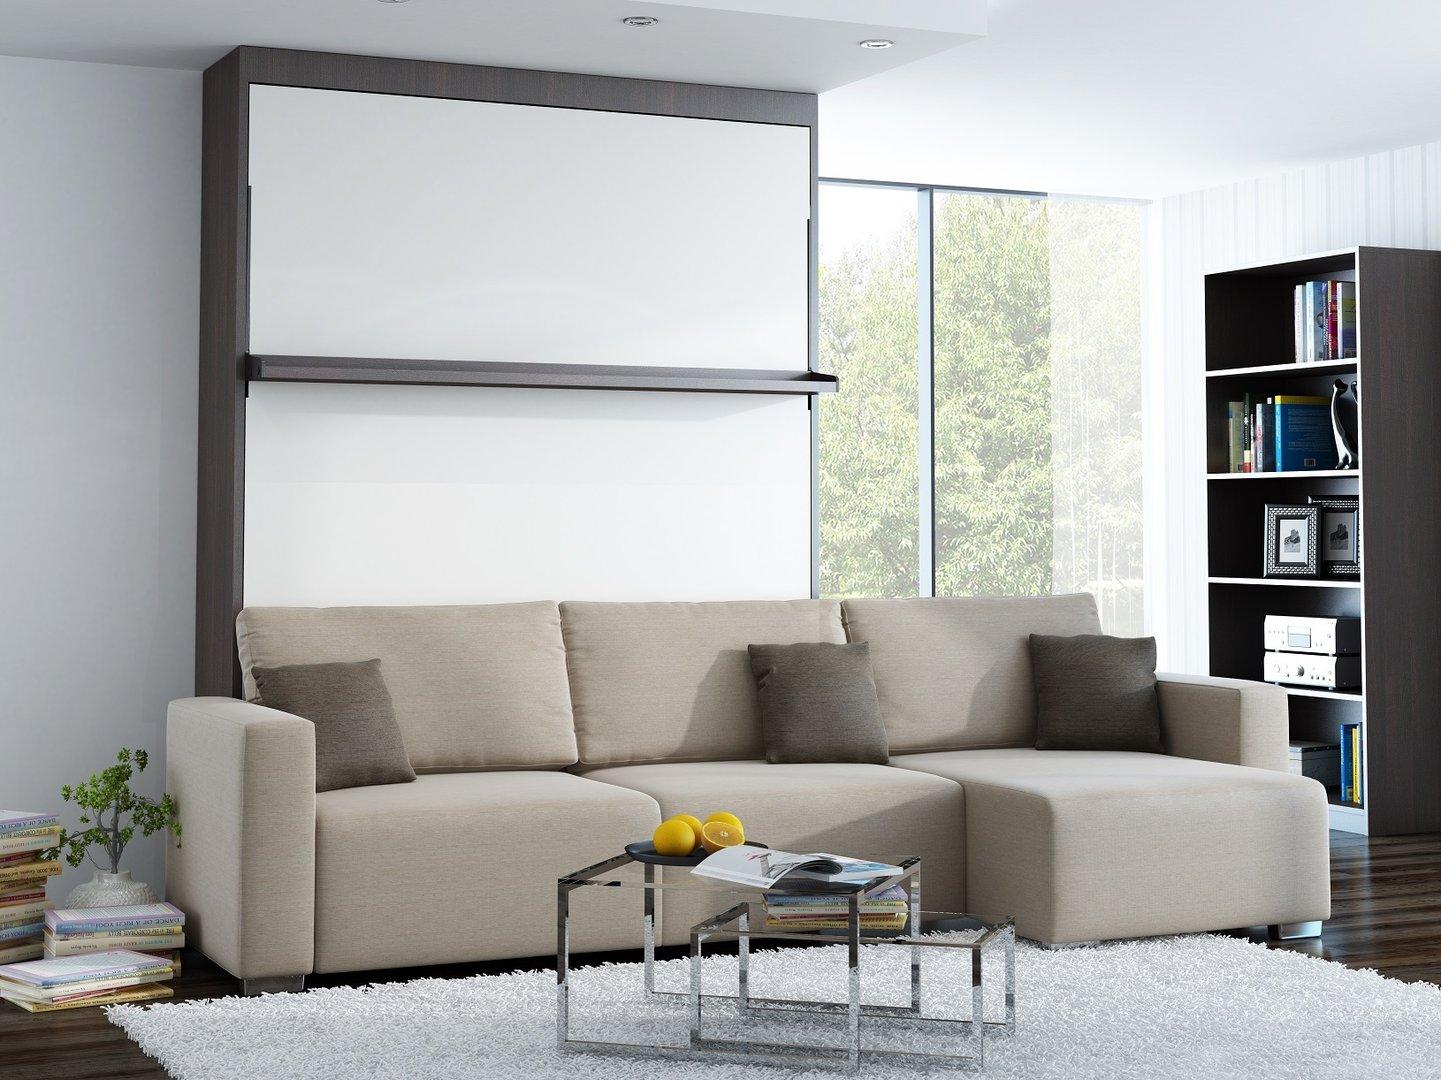 ts m bel wandbett mit sofa ecke leggio linea lw 140 x 200 cm. Black Bedroom Furniture Sets. Home Design Ideas